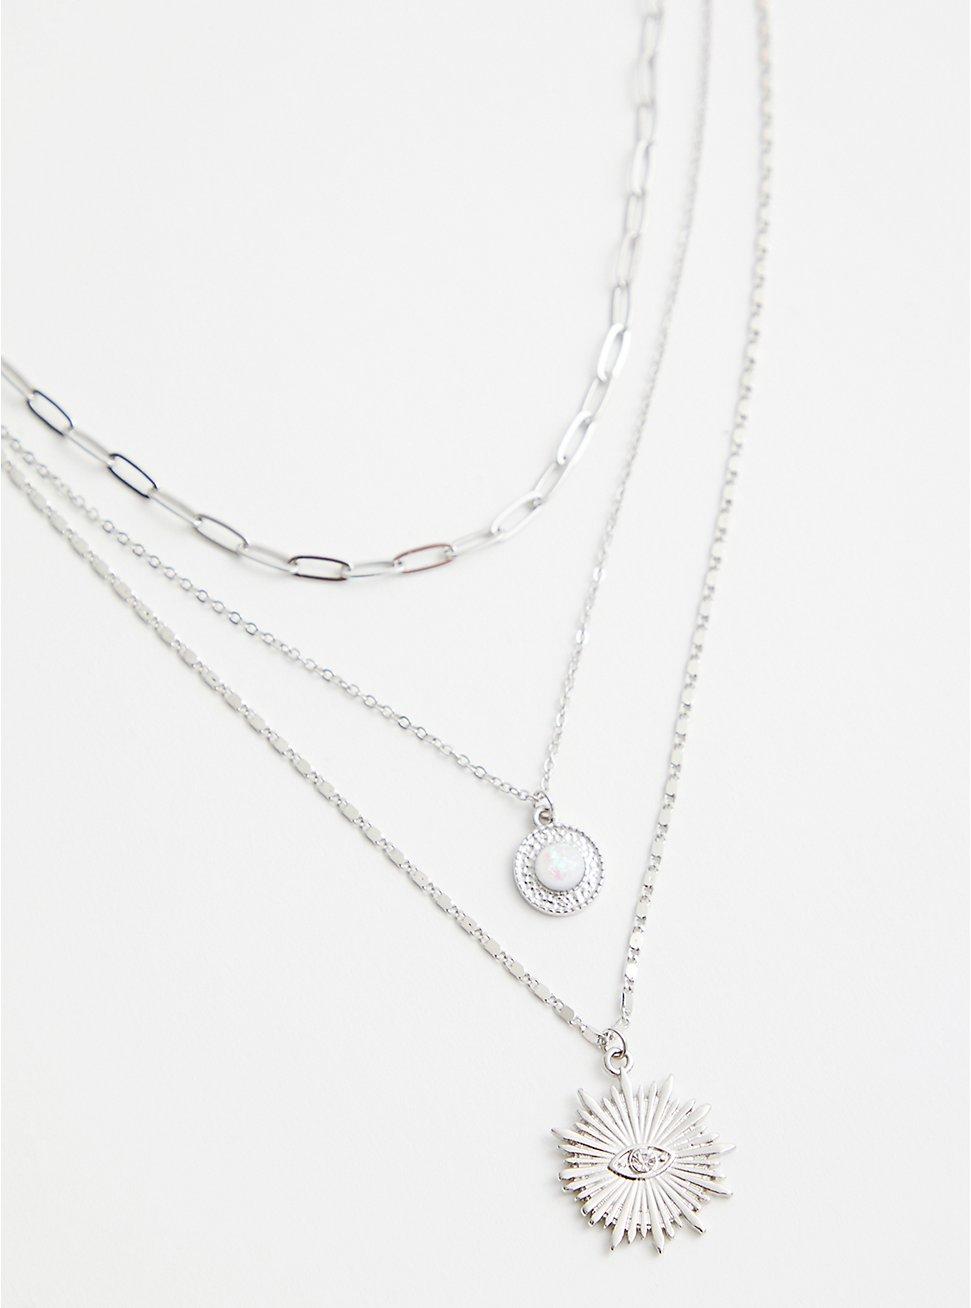 Silver-Tone Sunburst 3-Layer Necklace, , hi-res